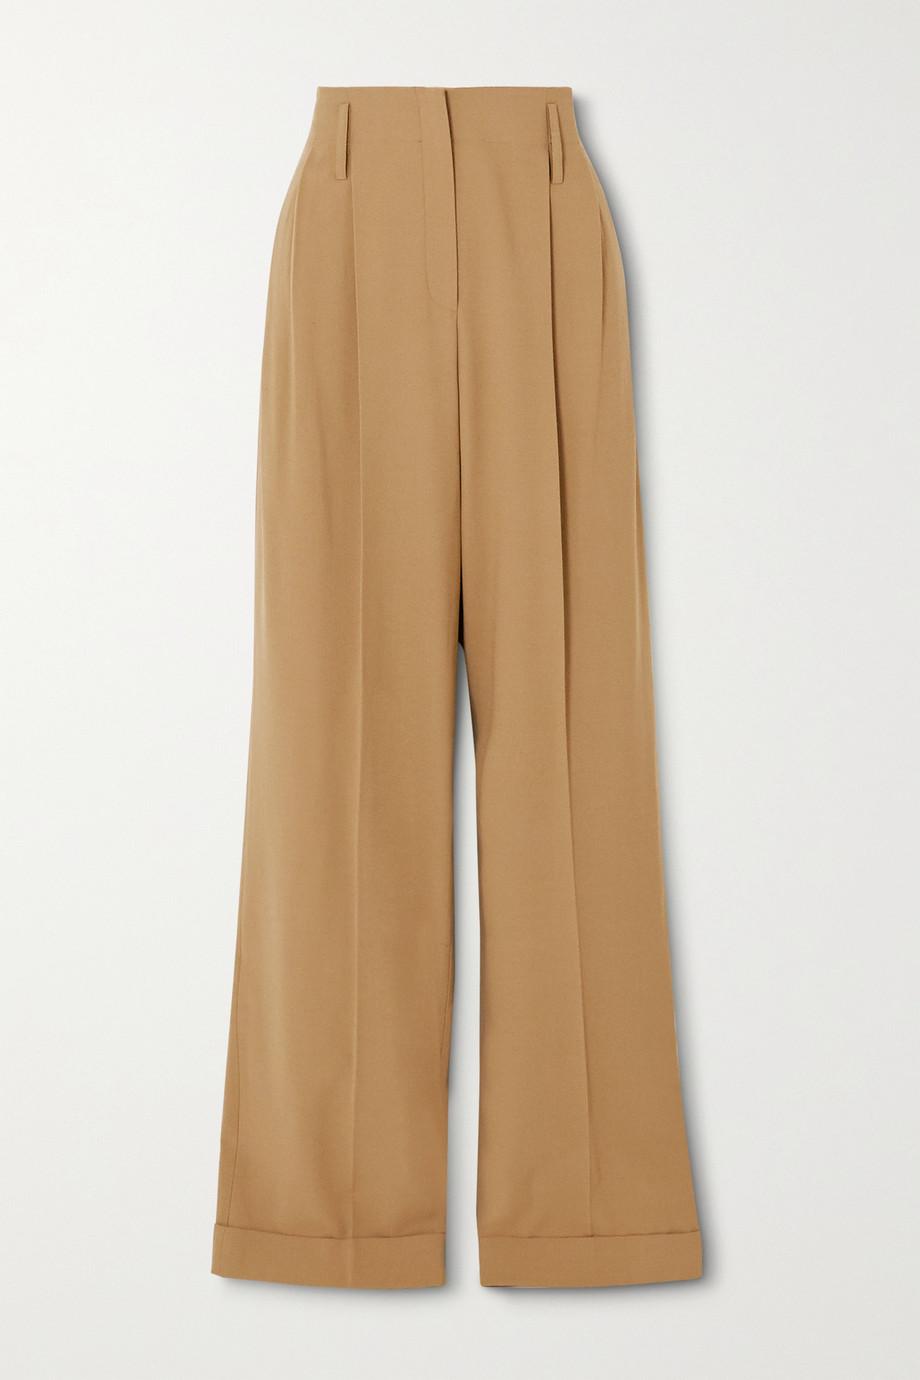 Michael Kors Collection Pleated wool straight-leg pants